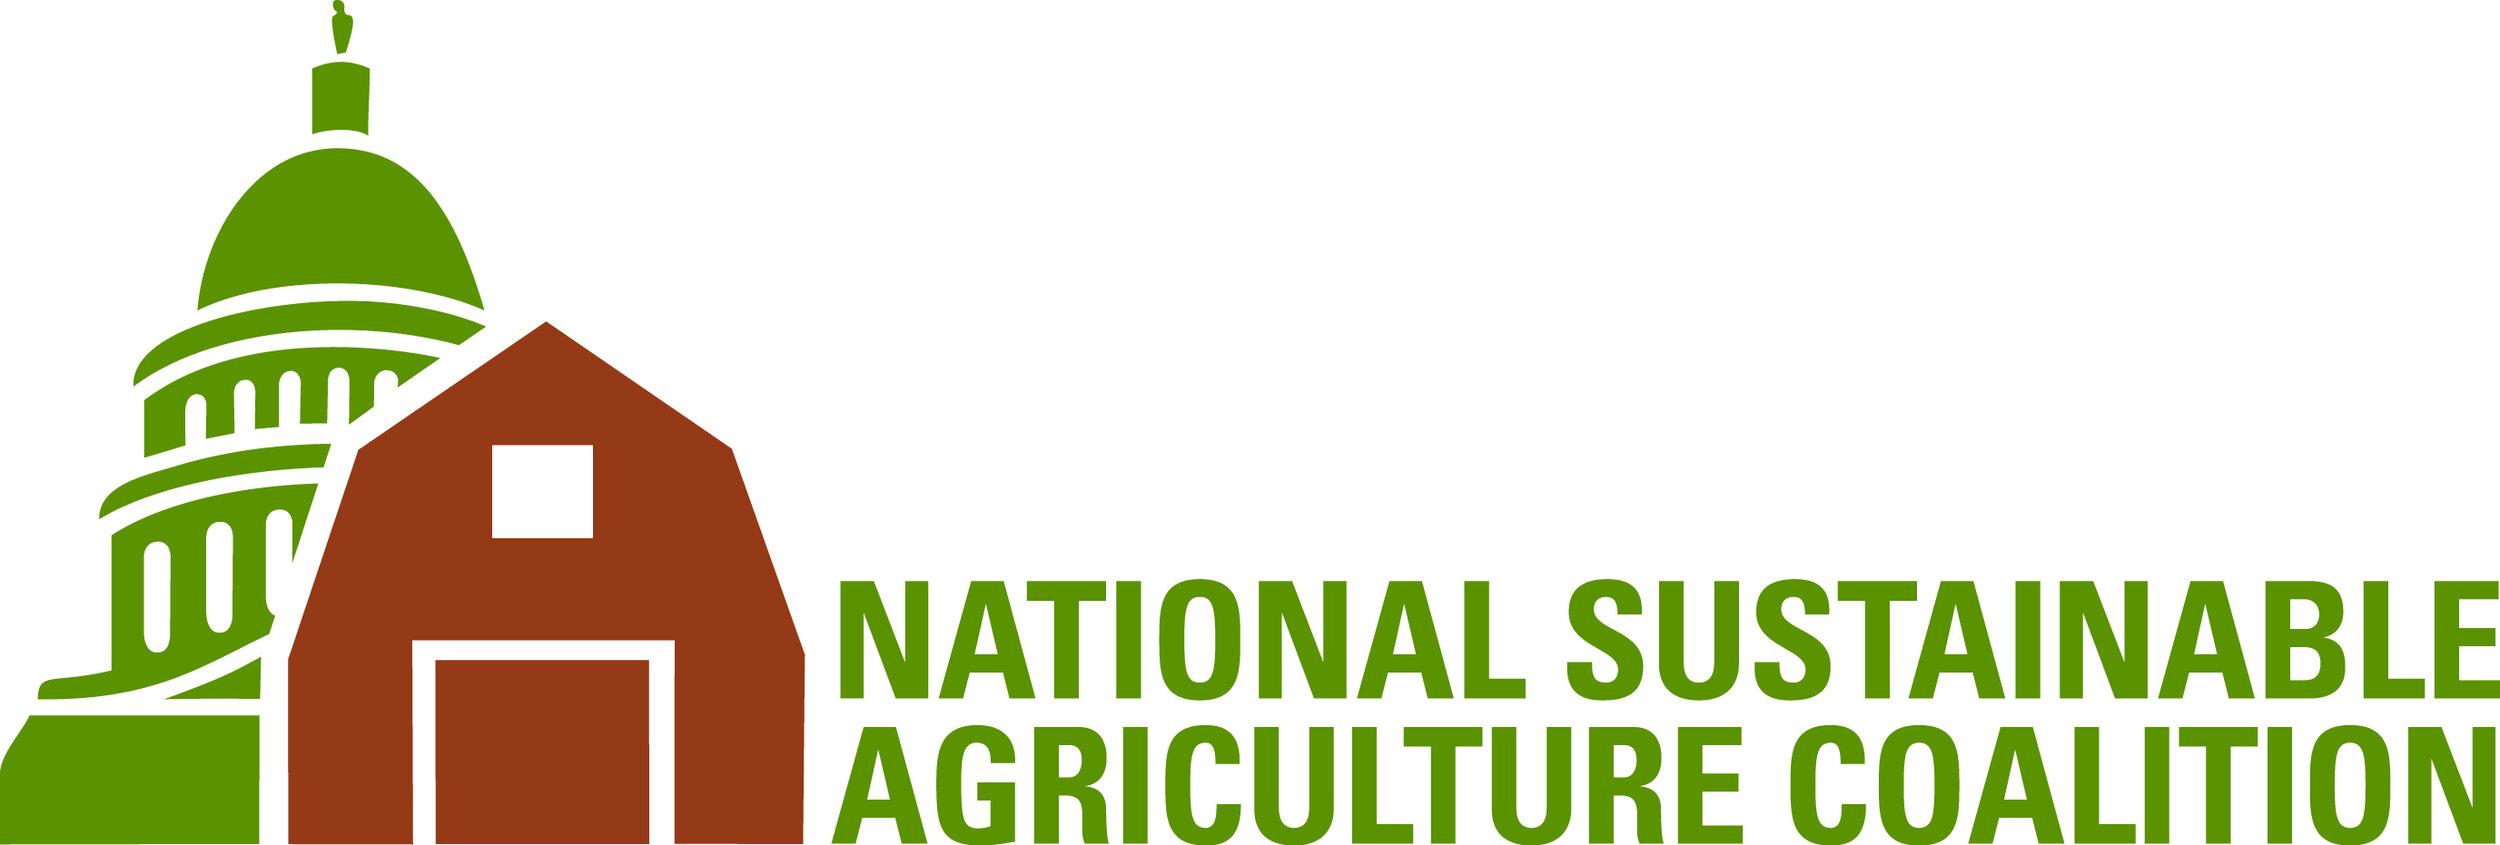 NSAC-logo2-color.jpg